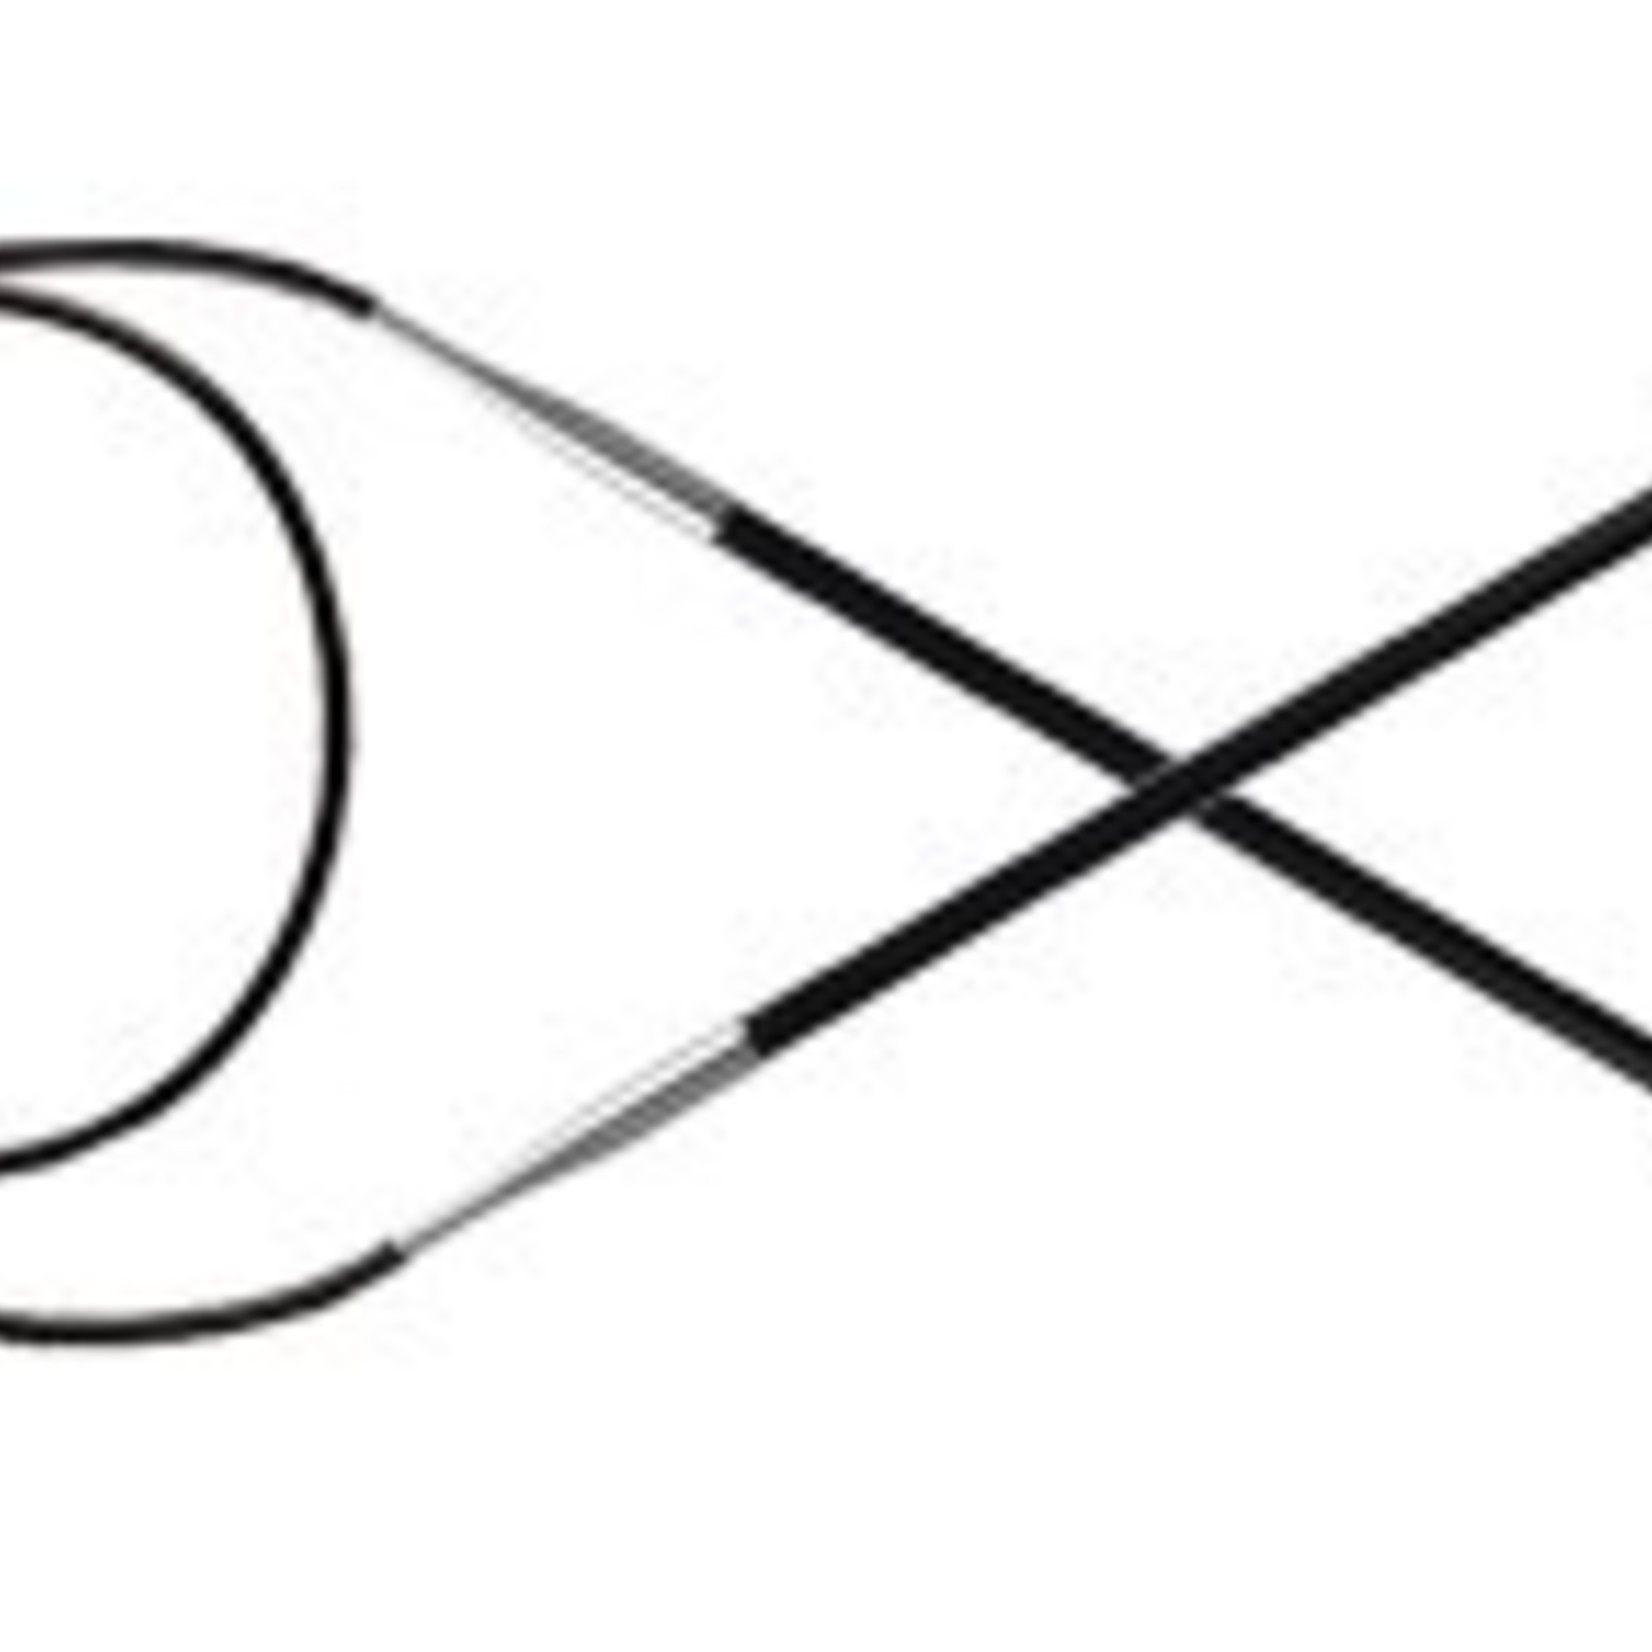 Knitter's Pride 4 Karbonz Circular 40